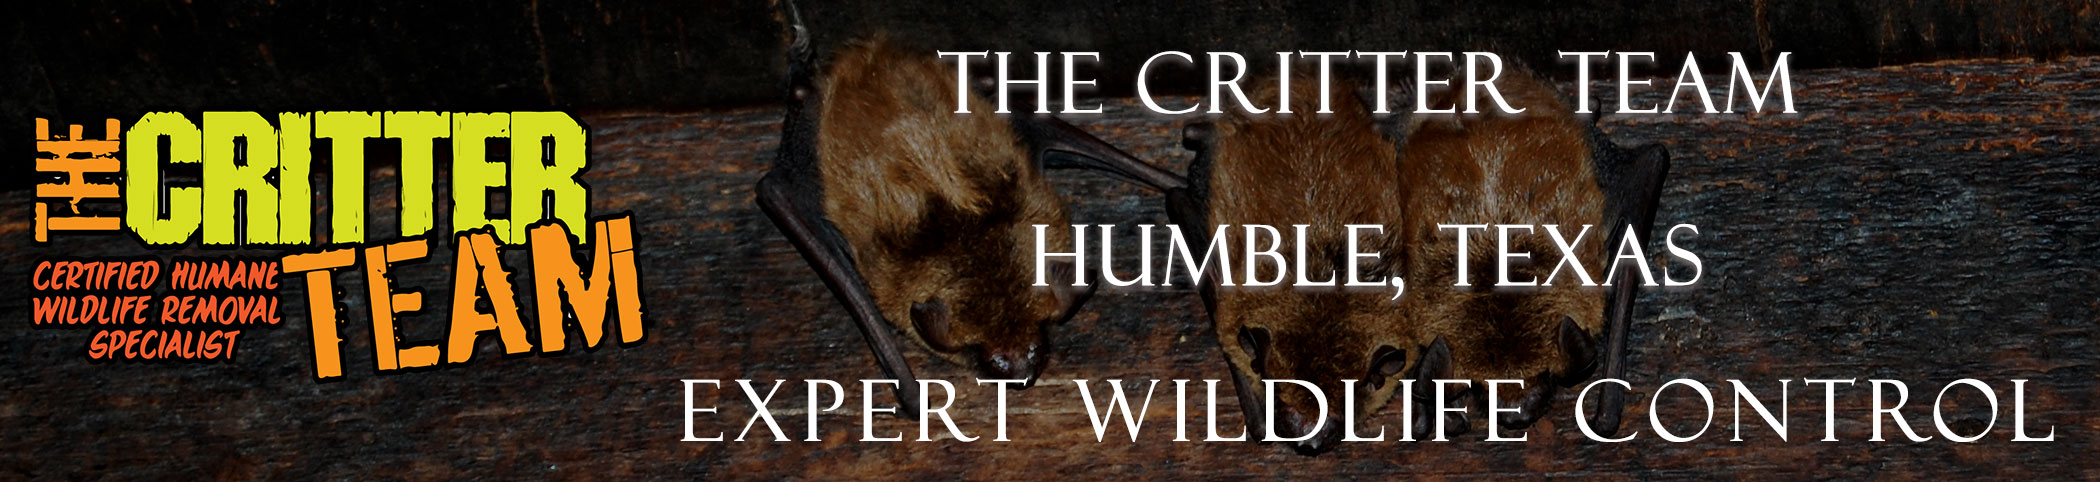 humble_texas_critter_team_headers